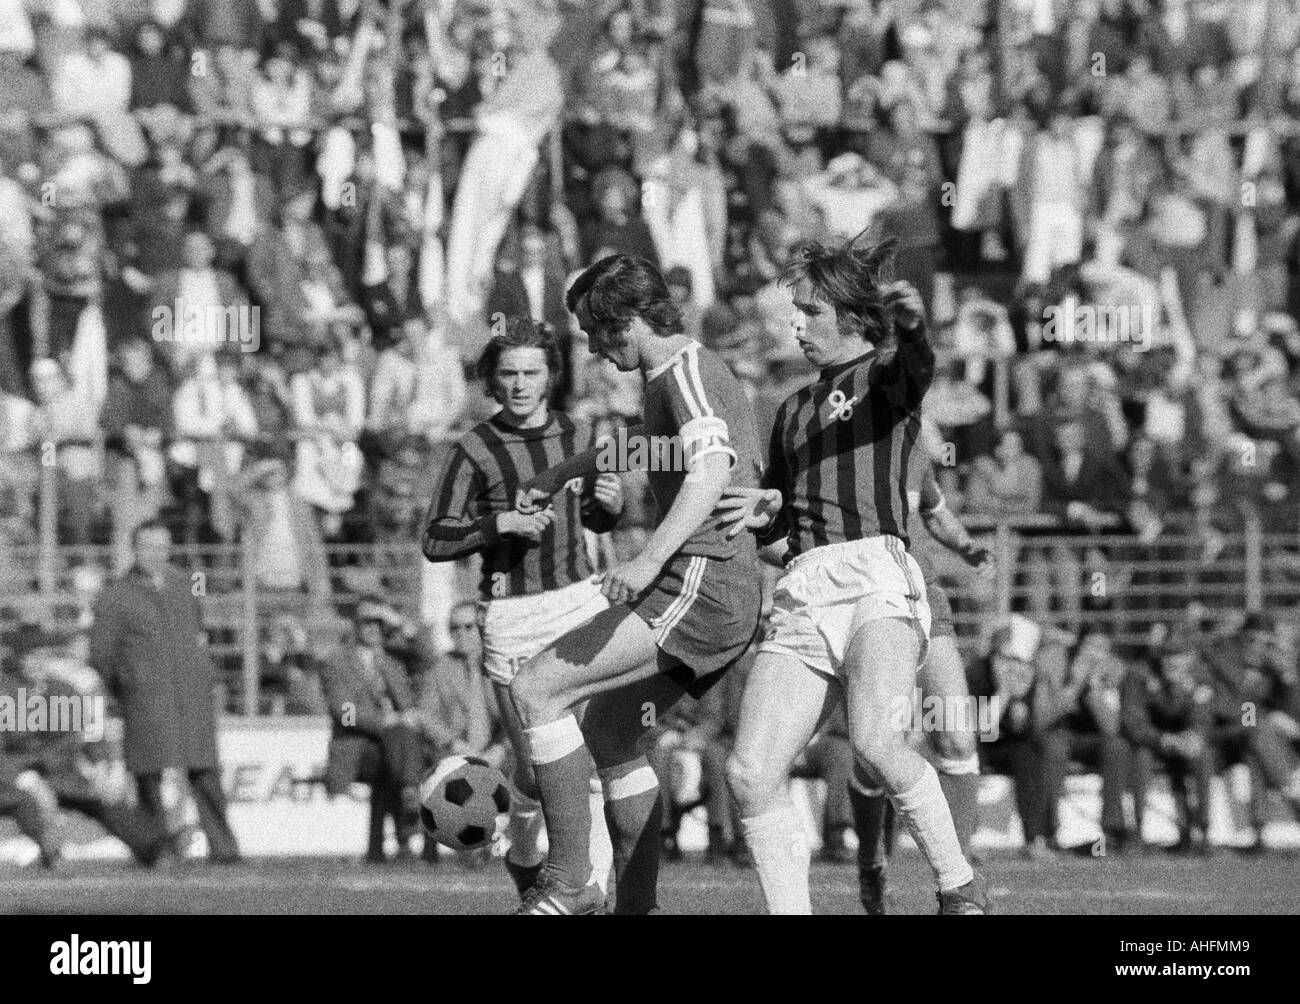 football, Bundesliga, 1971/1972, VfL Bochum versus Hanover 96 2:2, Stadium at the Castroper Strasse in Bochum, scene of the match, f.l.t.r. Peter Ruehmkorb (96), Hans Walitza (Bochum), Peter Anders (96) - Stock Image